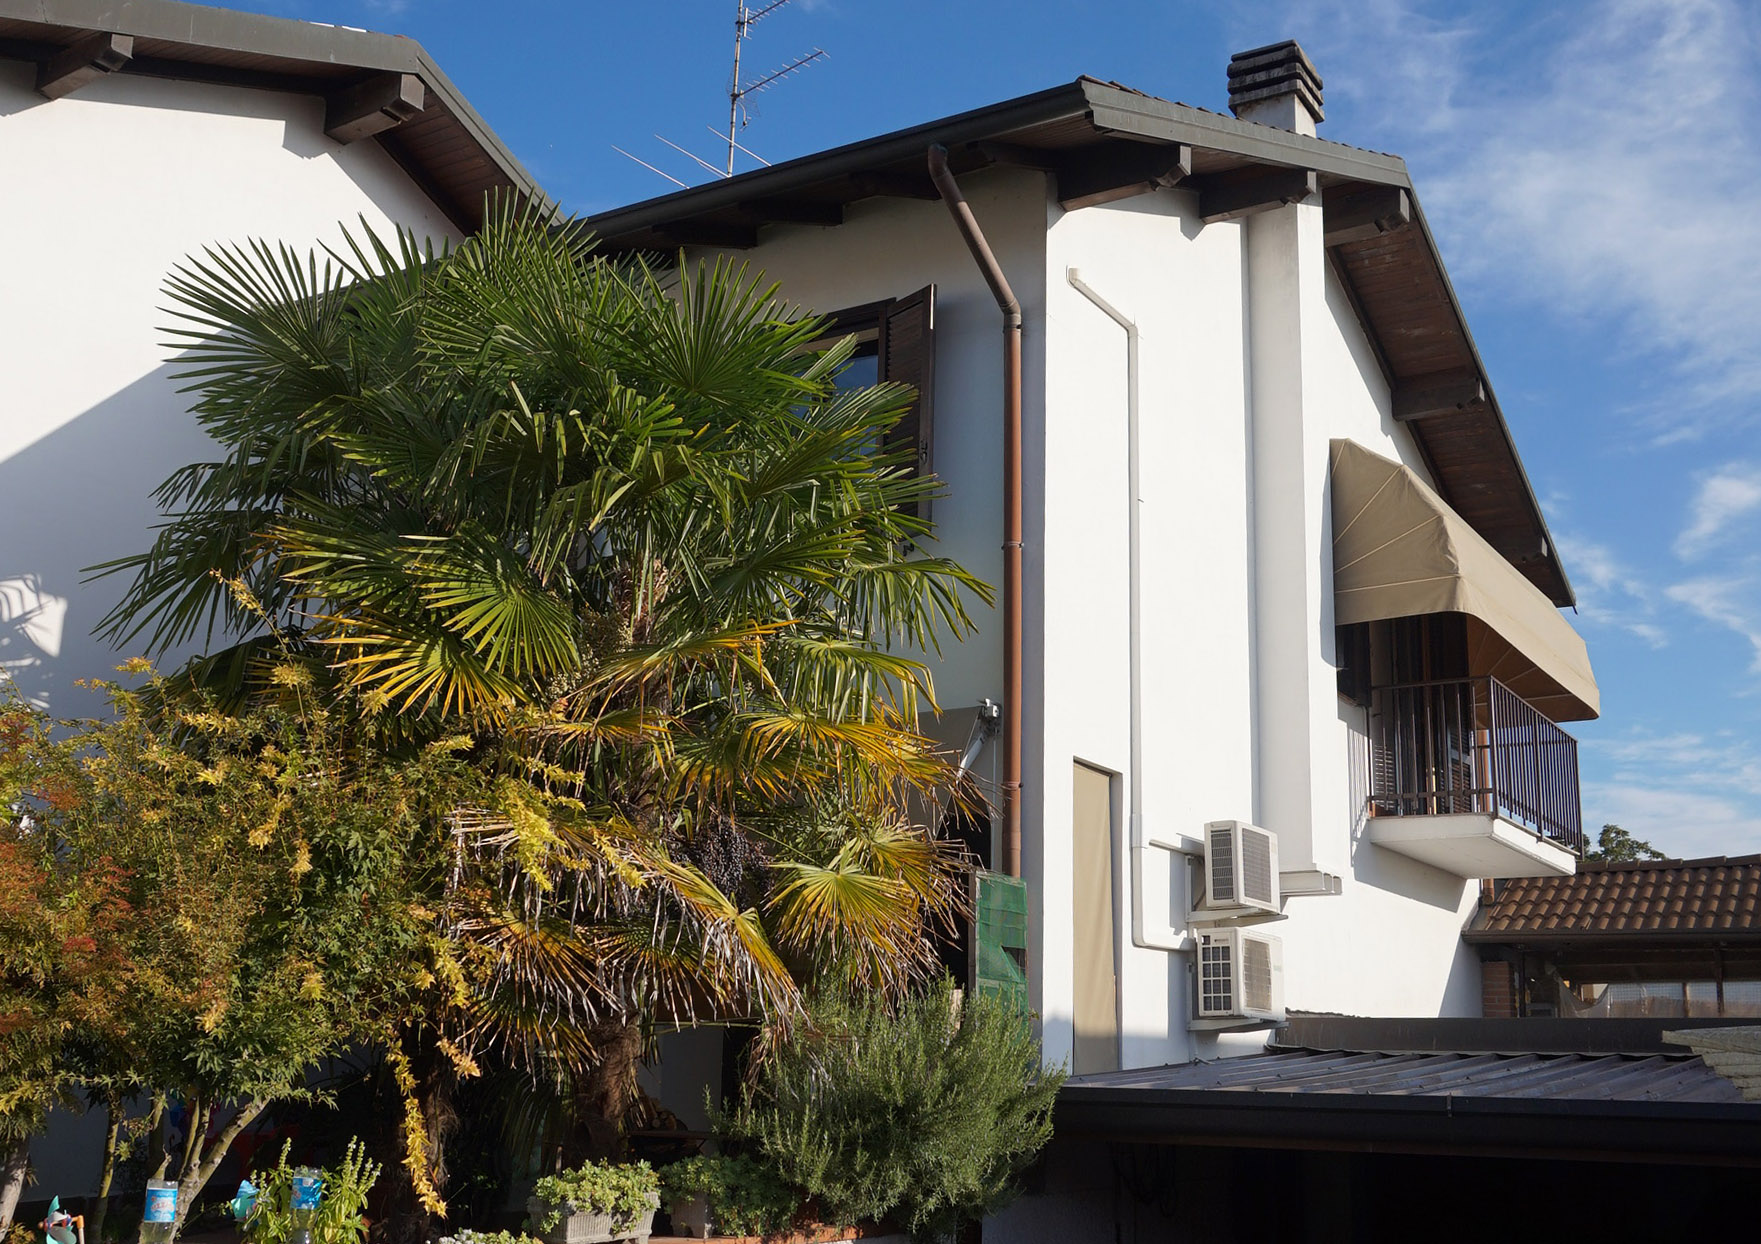 Villetta con giardino a Robecchetto con Induno